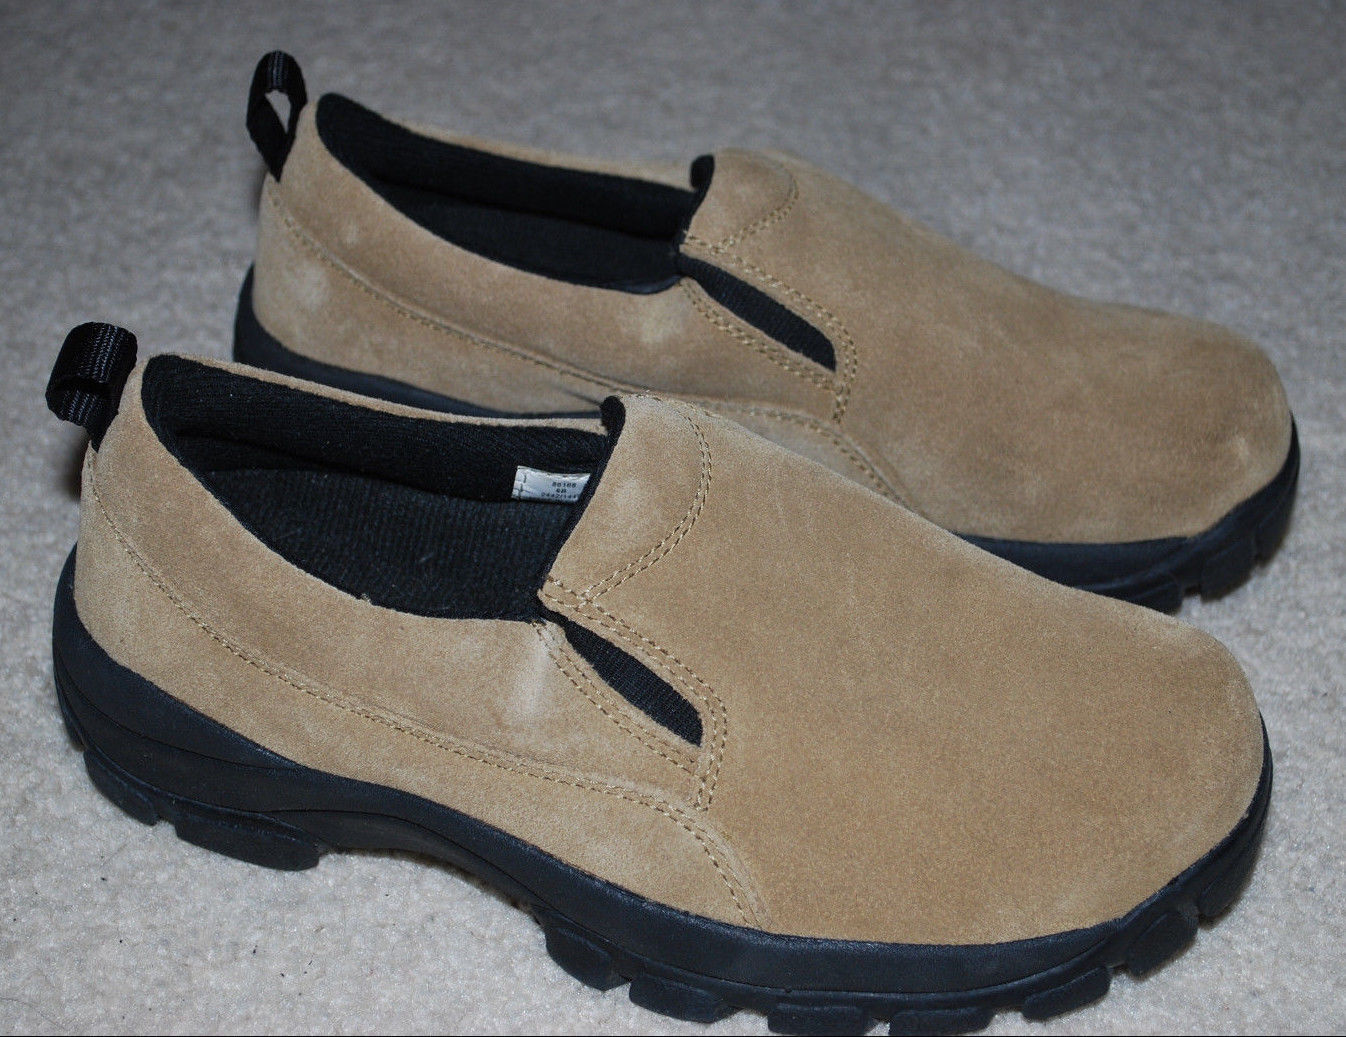 fe74cd661e14 Lands End Shoes Ladies 6 B Tan Suede Black and 50 similar items. S l1600